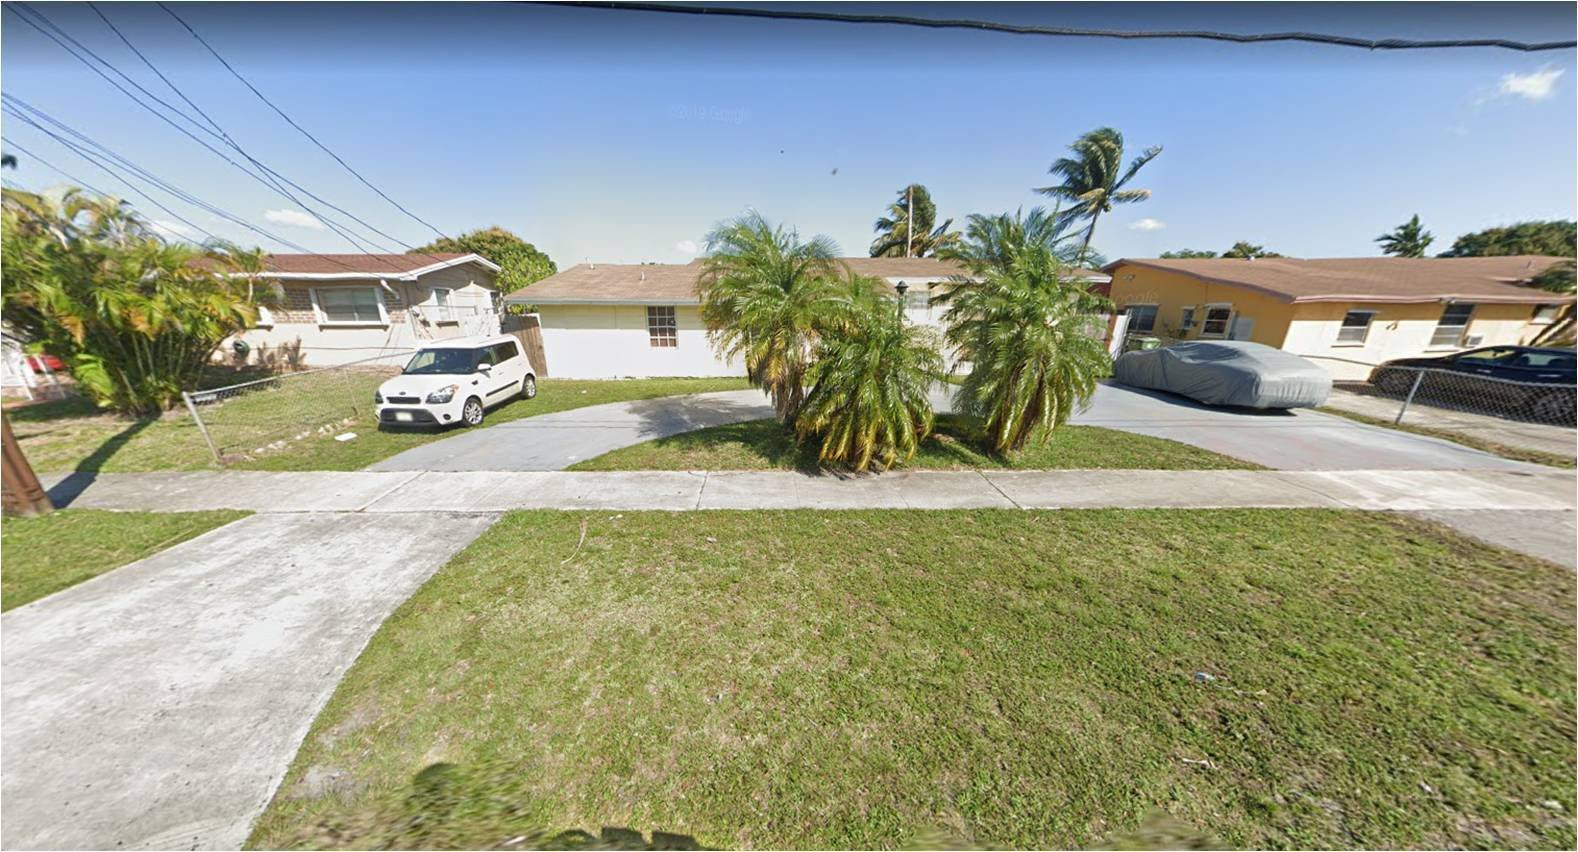 1129 W 51 Place, Hialeah, FL 33012